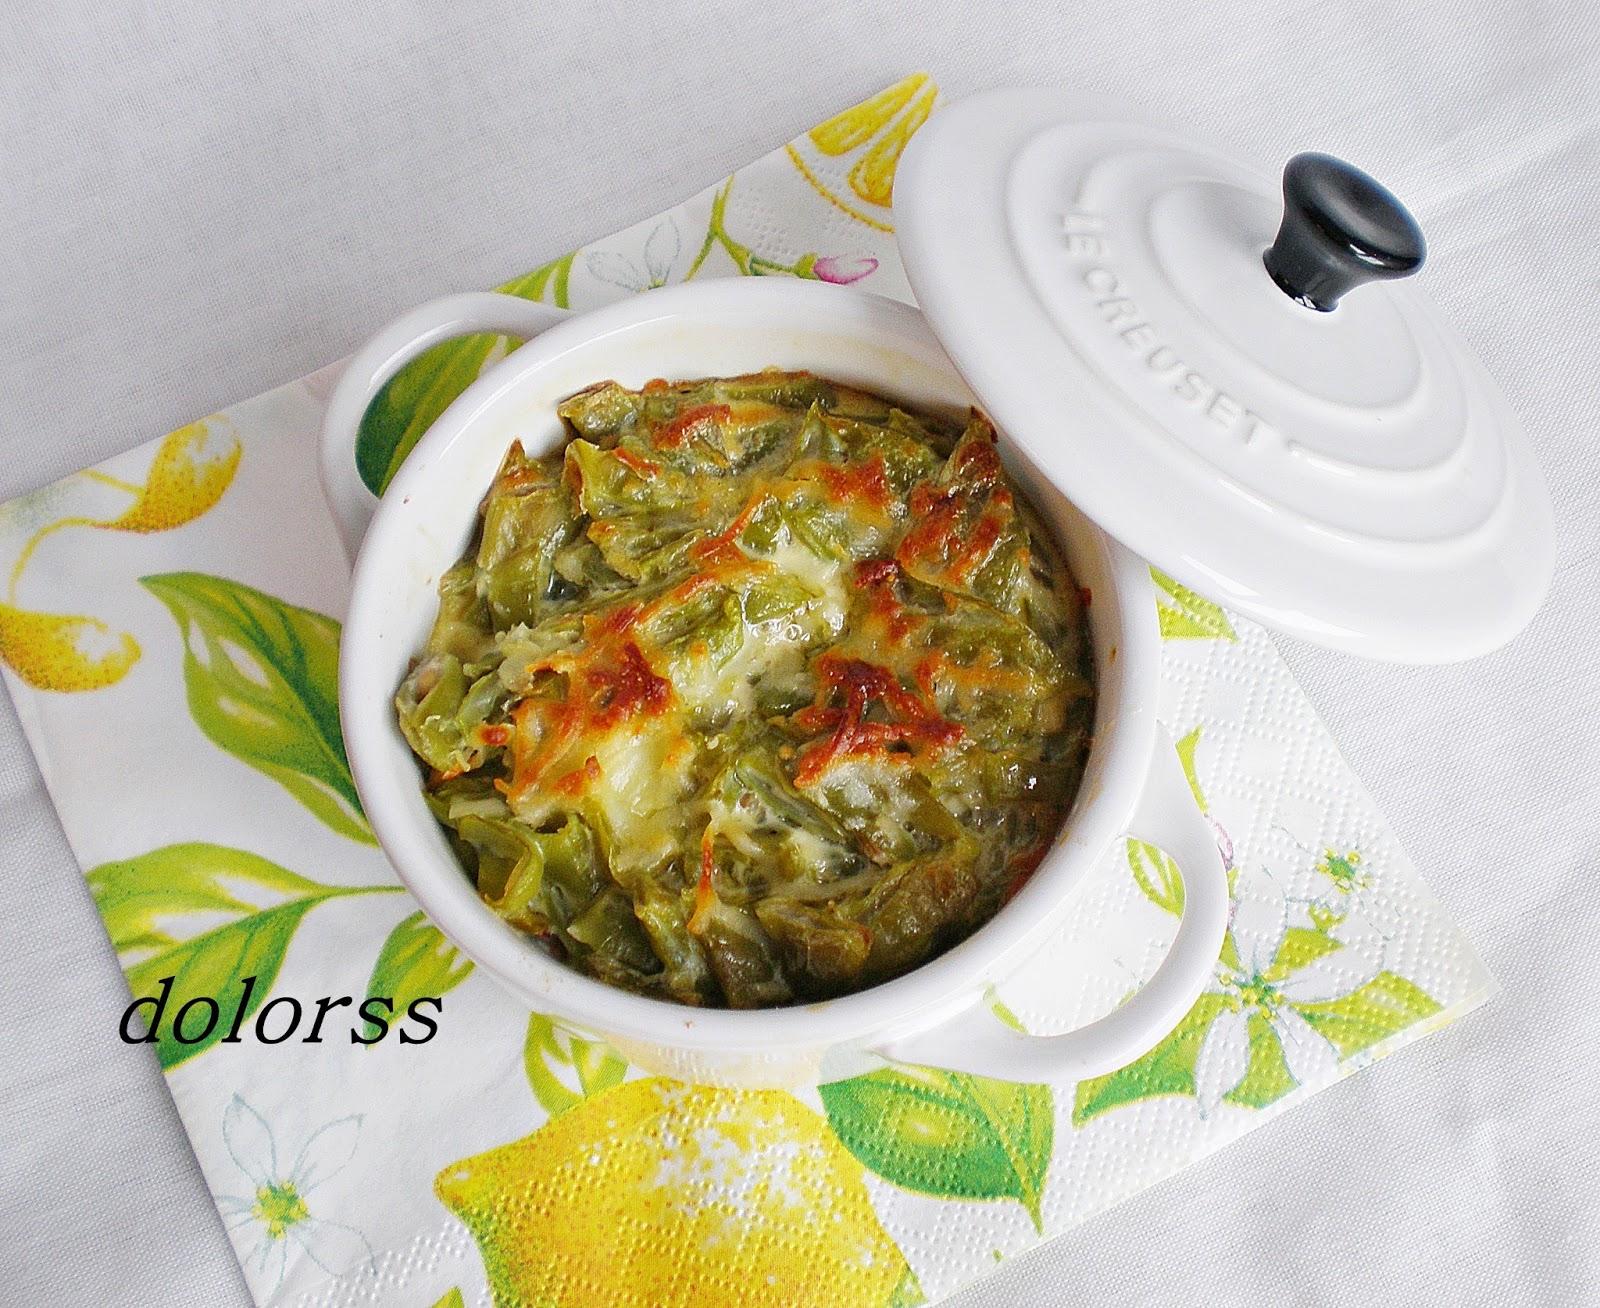 Blog de cuina de la dolorss jud as verdes gratinadas - Judias verdes en olla express ...